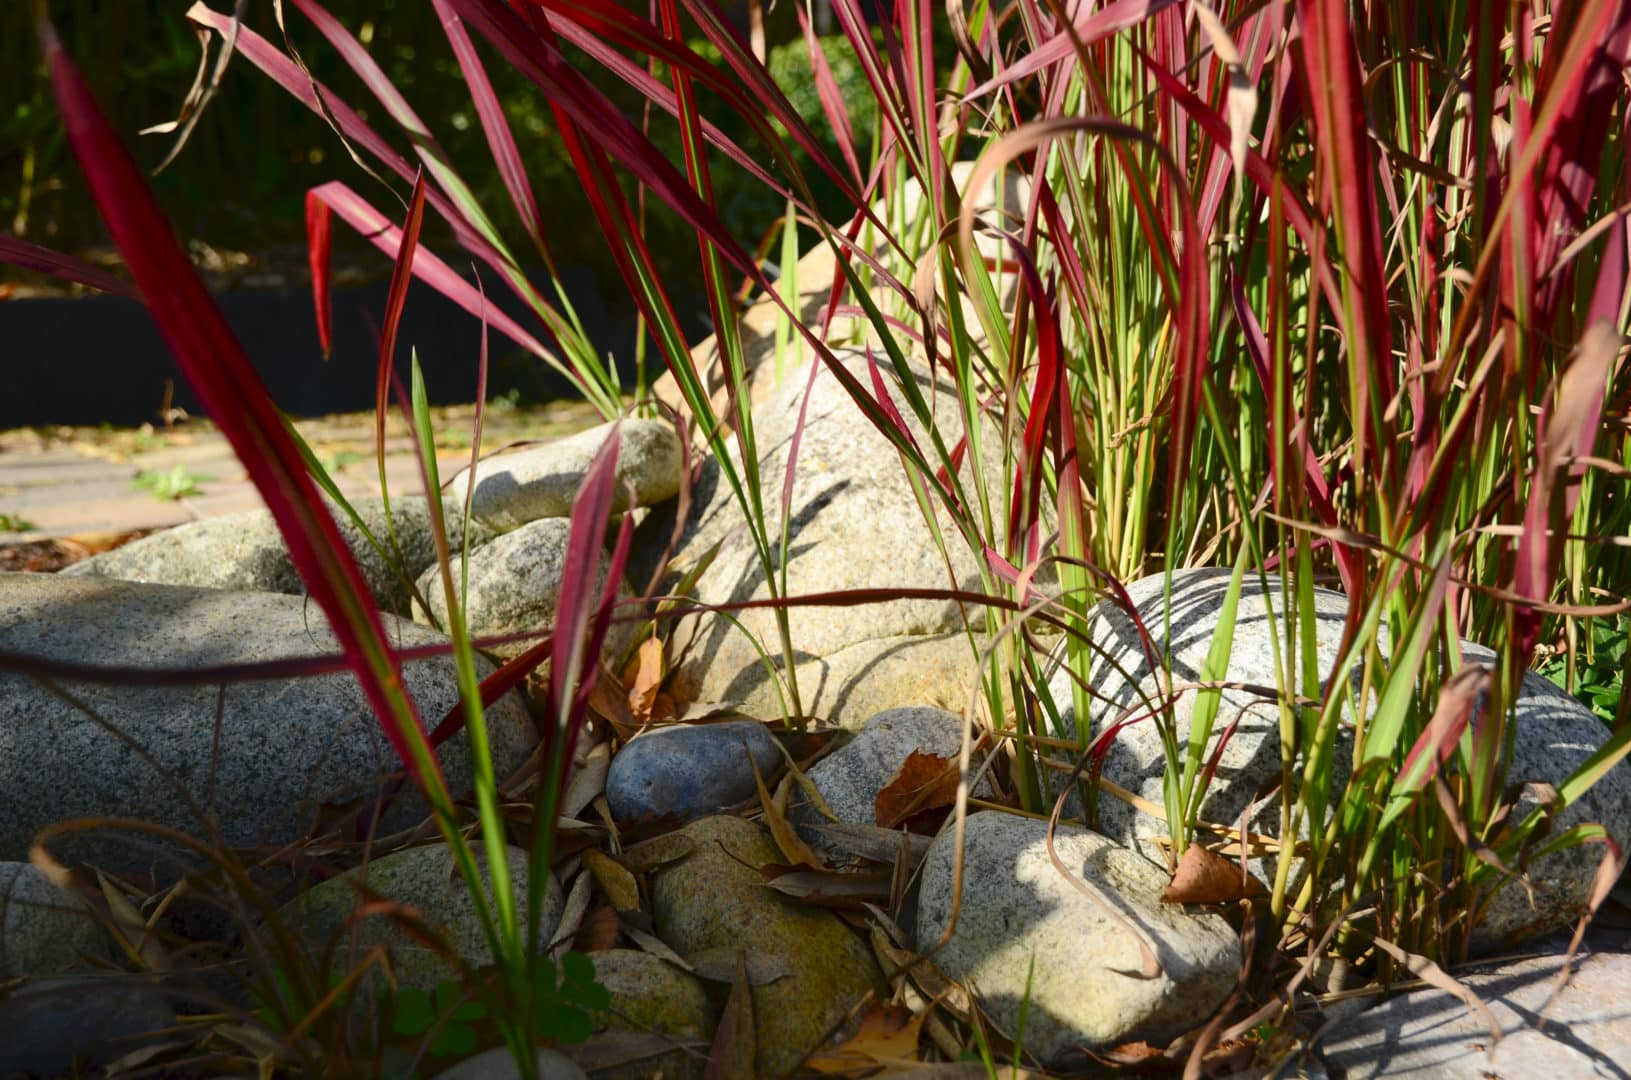 Jardinier paysagiste entretien jardin Fouesnant Benodet 4 - Bureau d'études